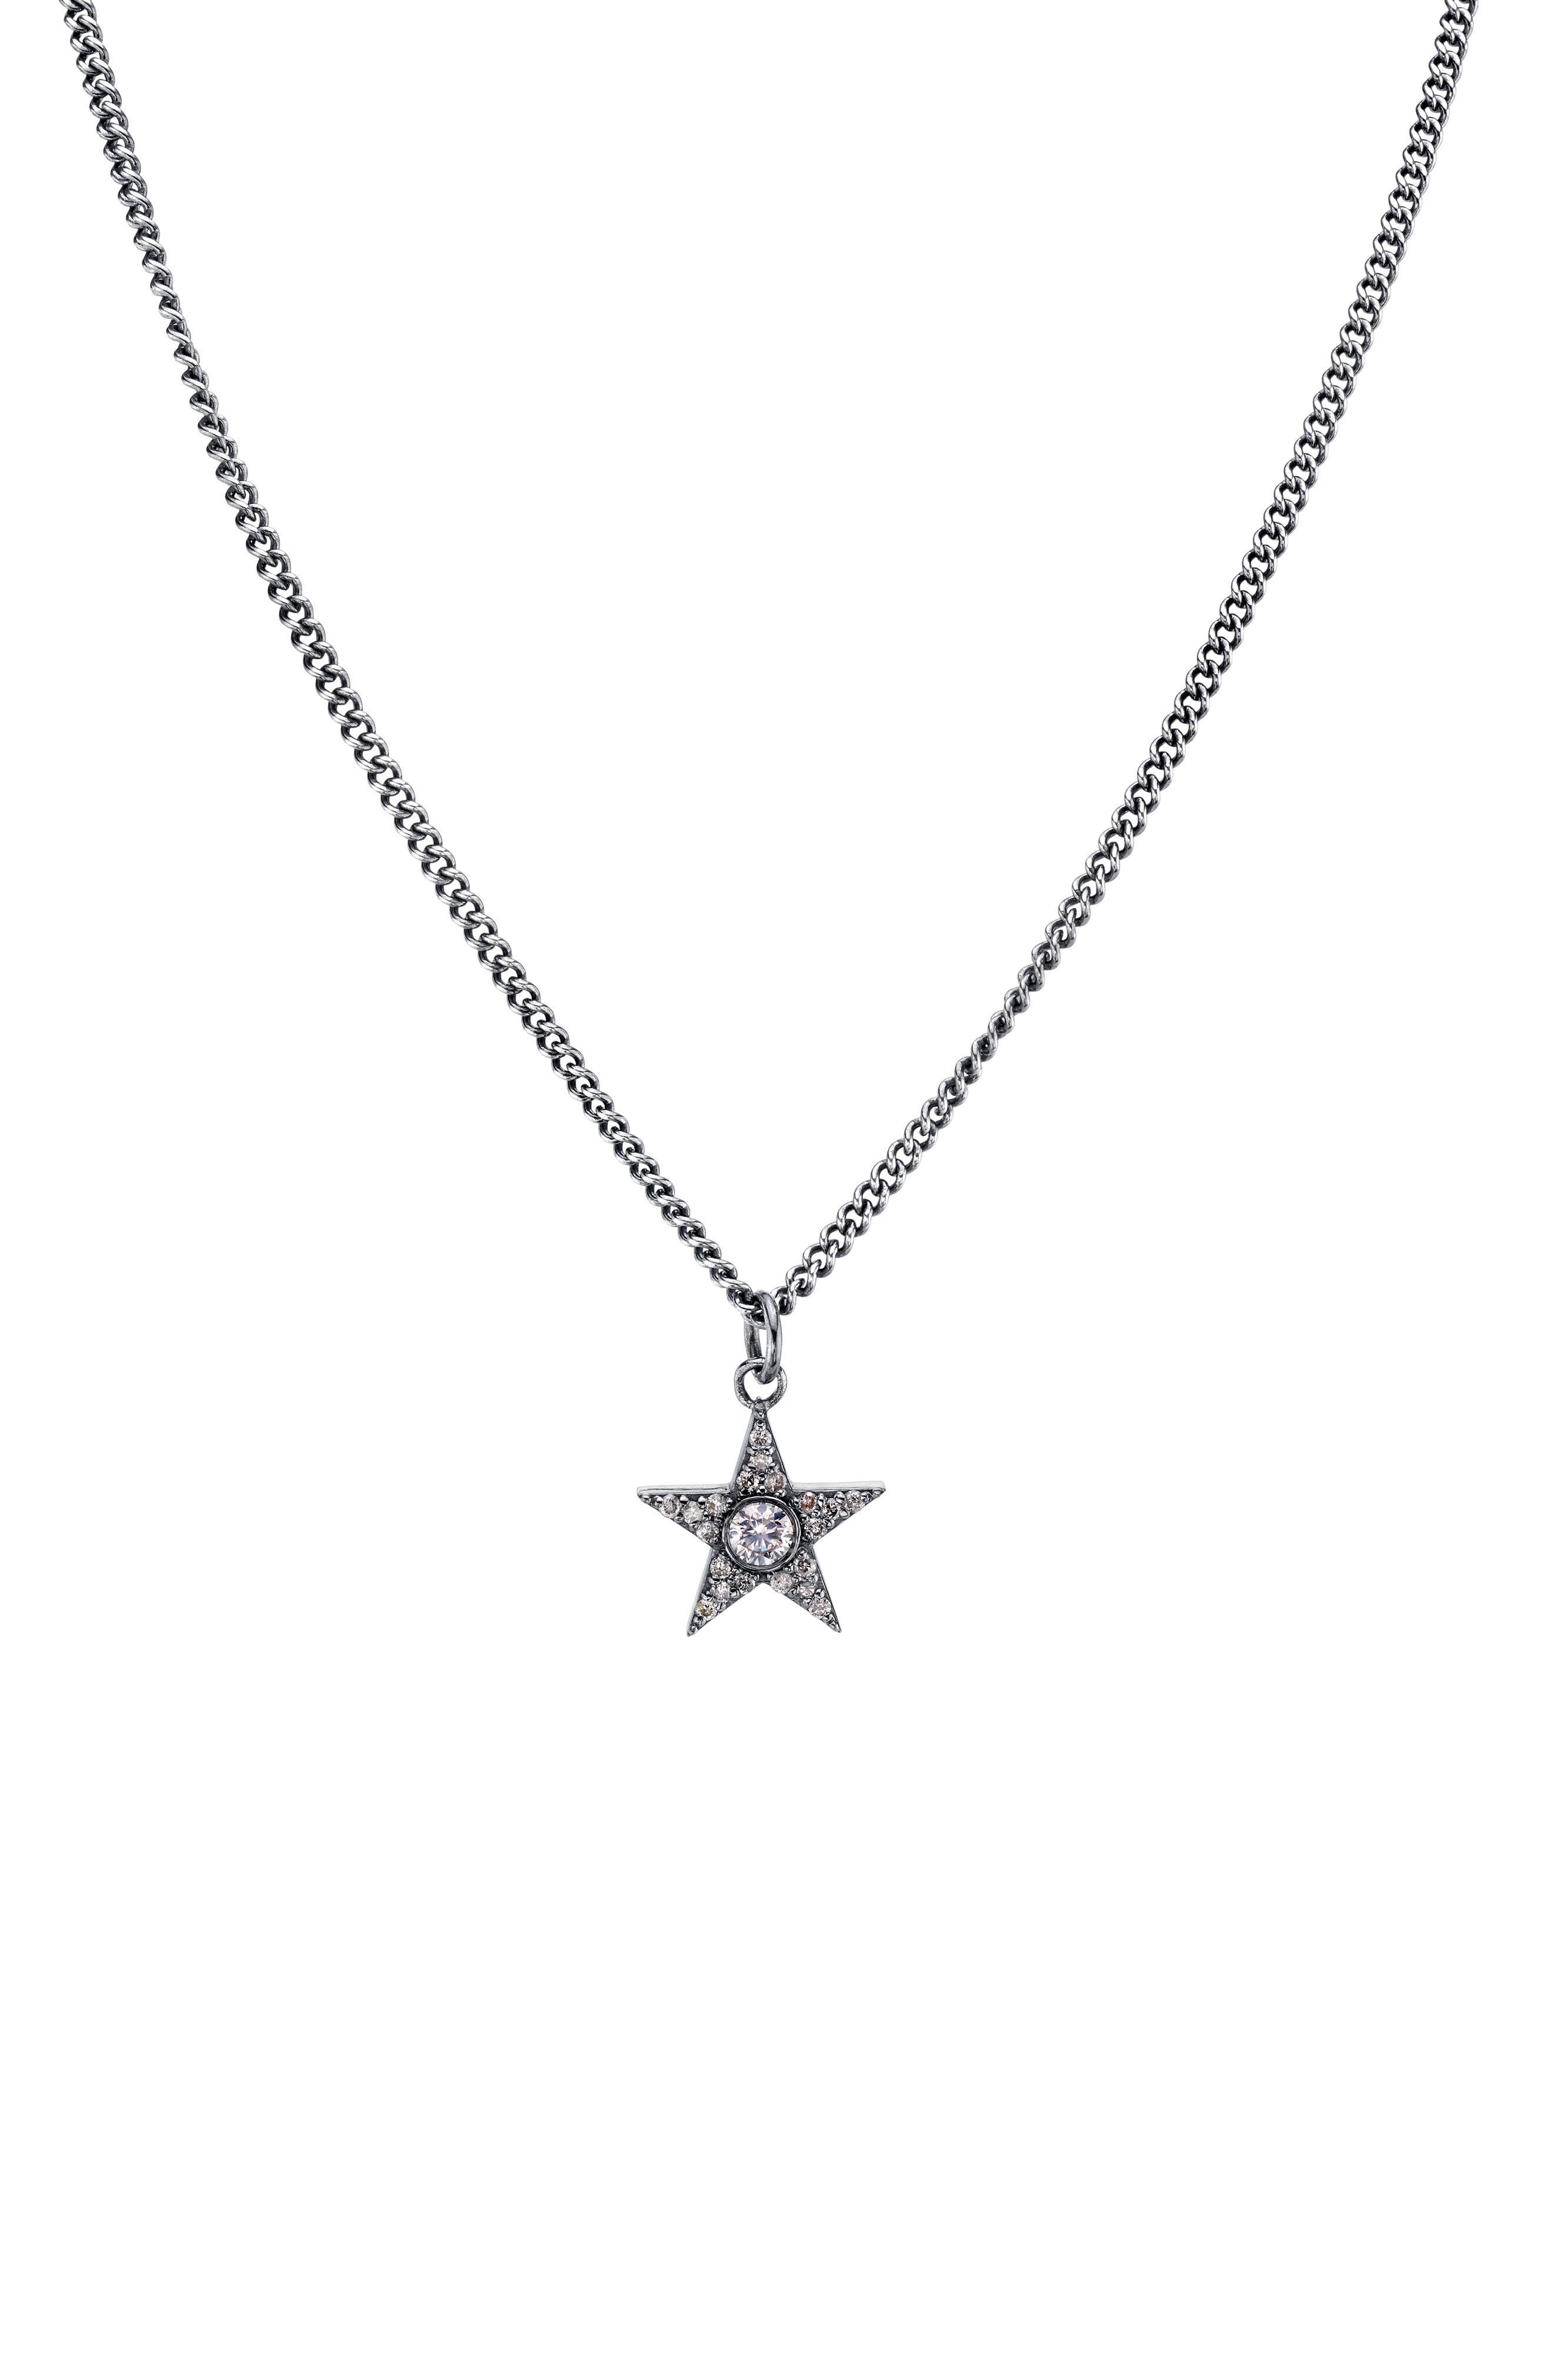 Bezel Diamond Star Pendant Necklace in Sterling Silver